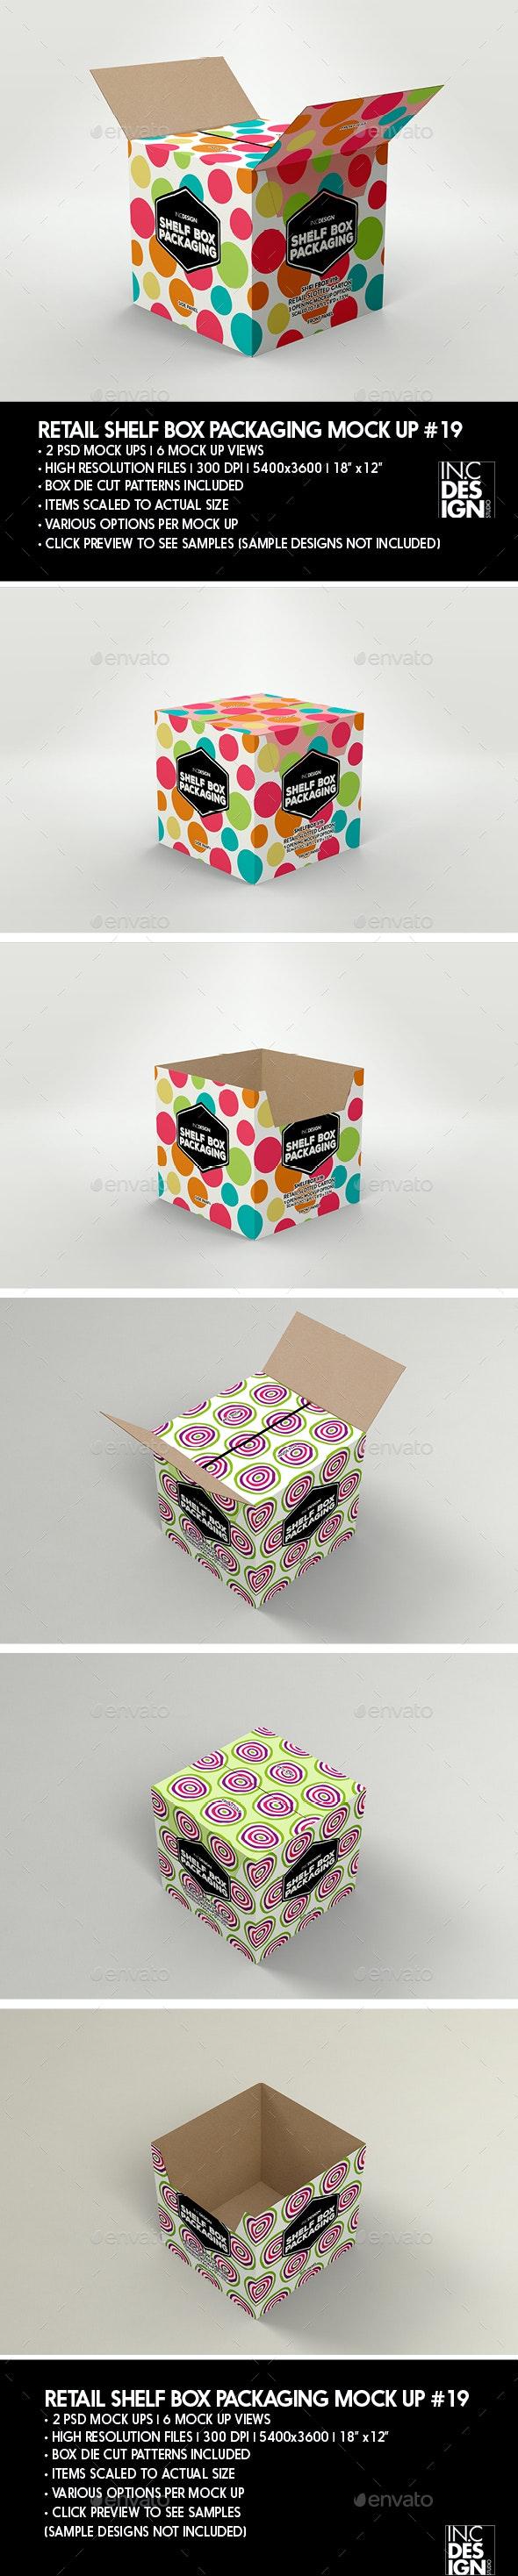 Retail Shelf Box Packaging MockUp No.19 - Packaging Product Mock-Ups